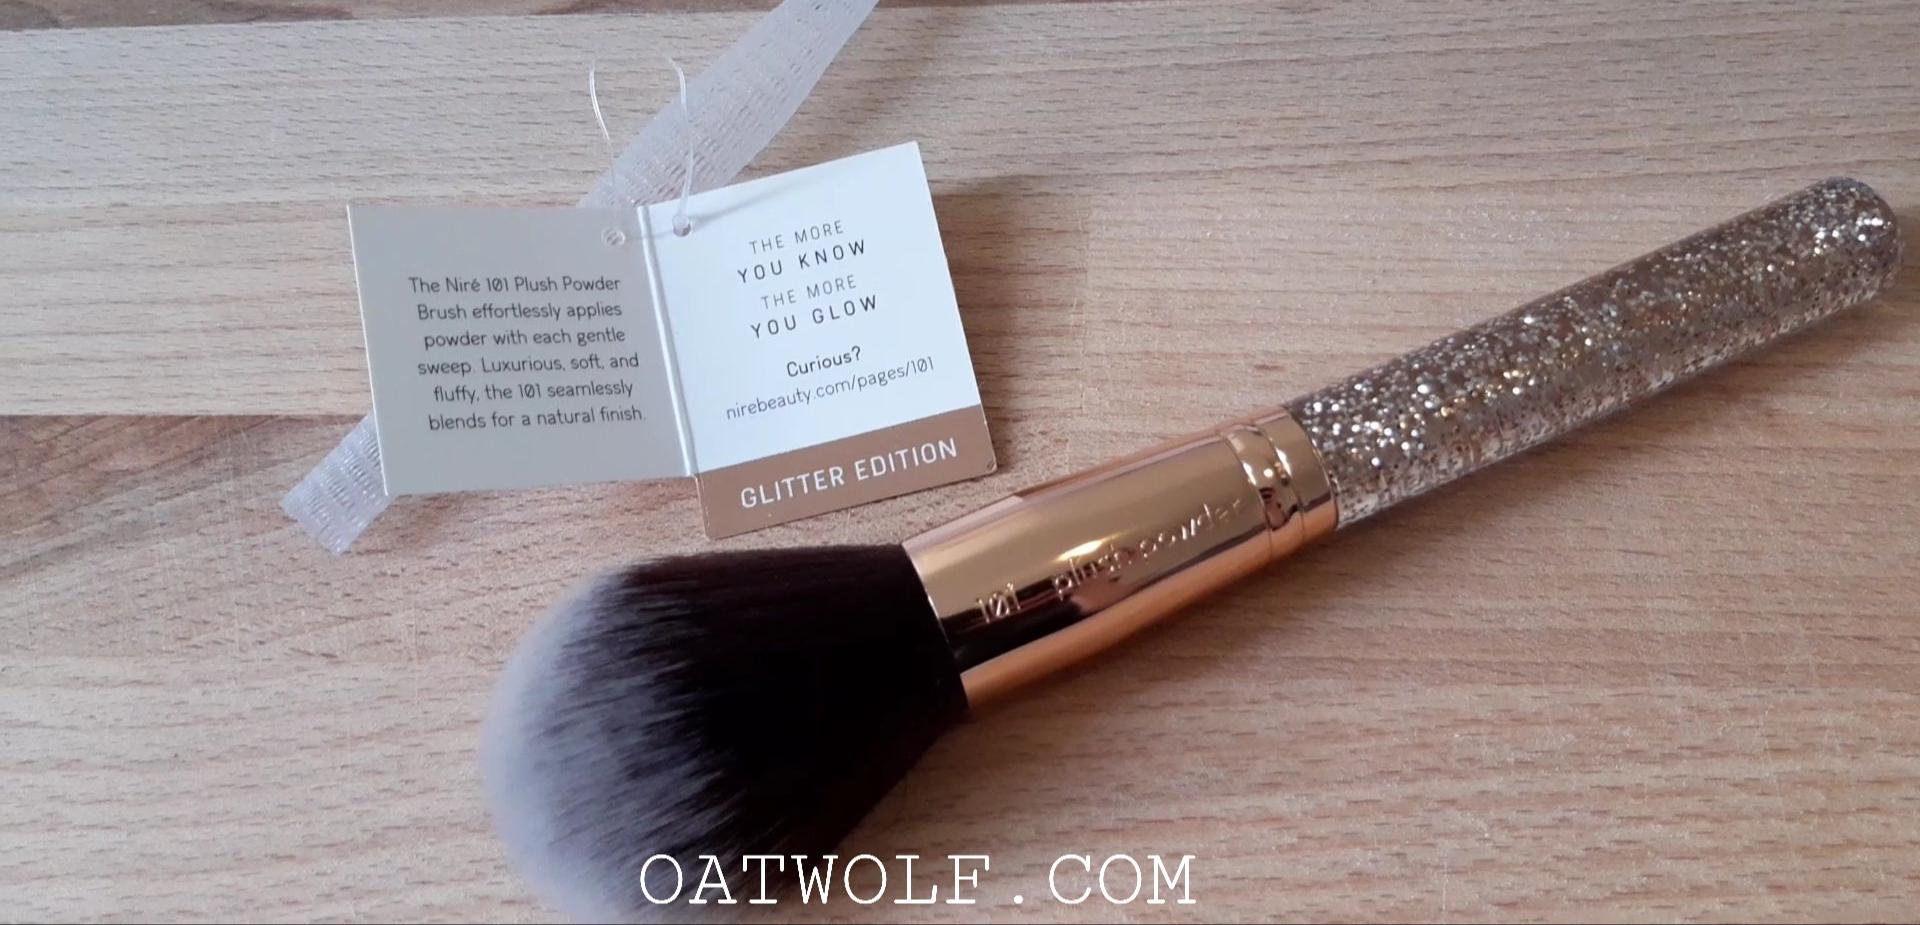 Niré Beauty plush powder brush